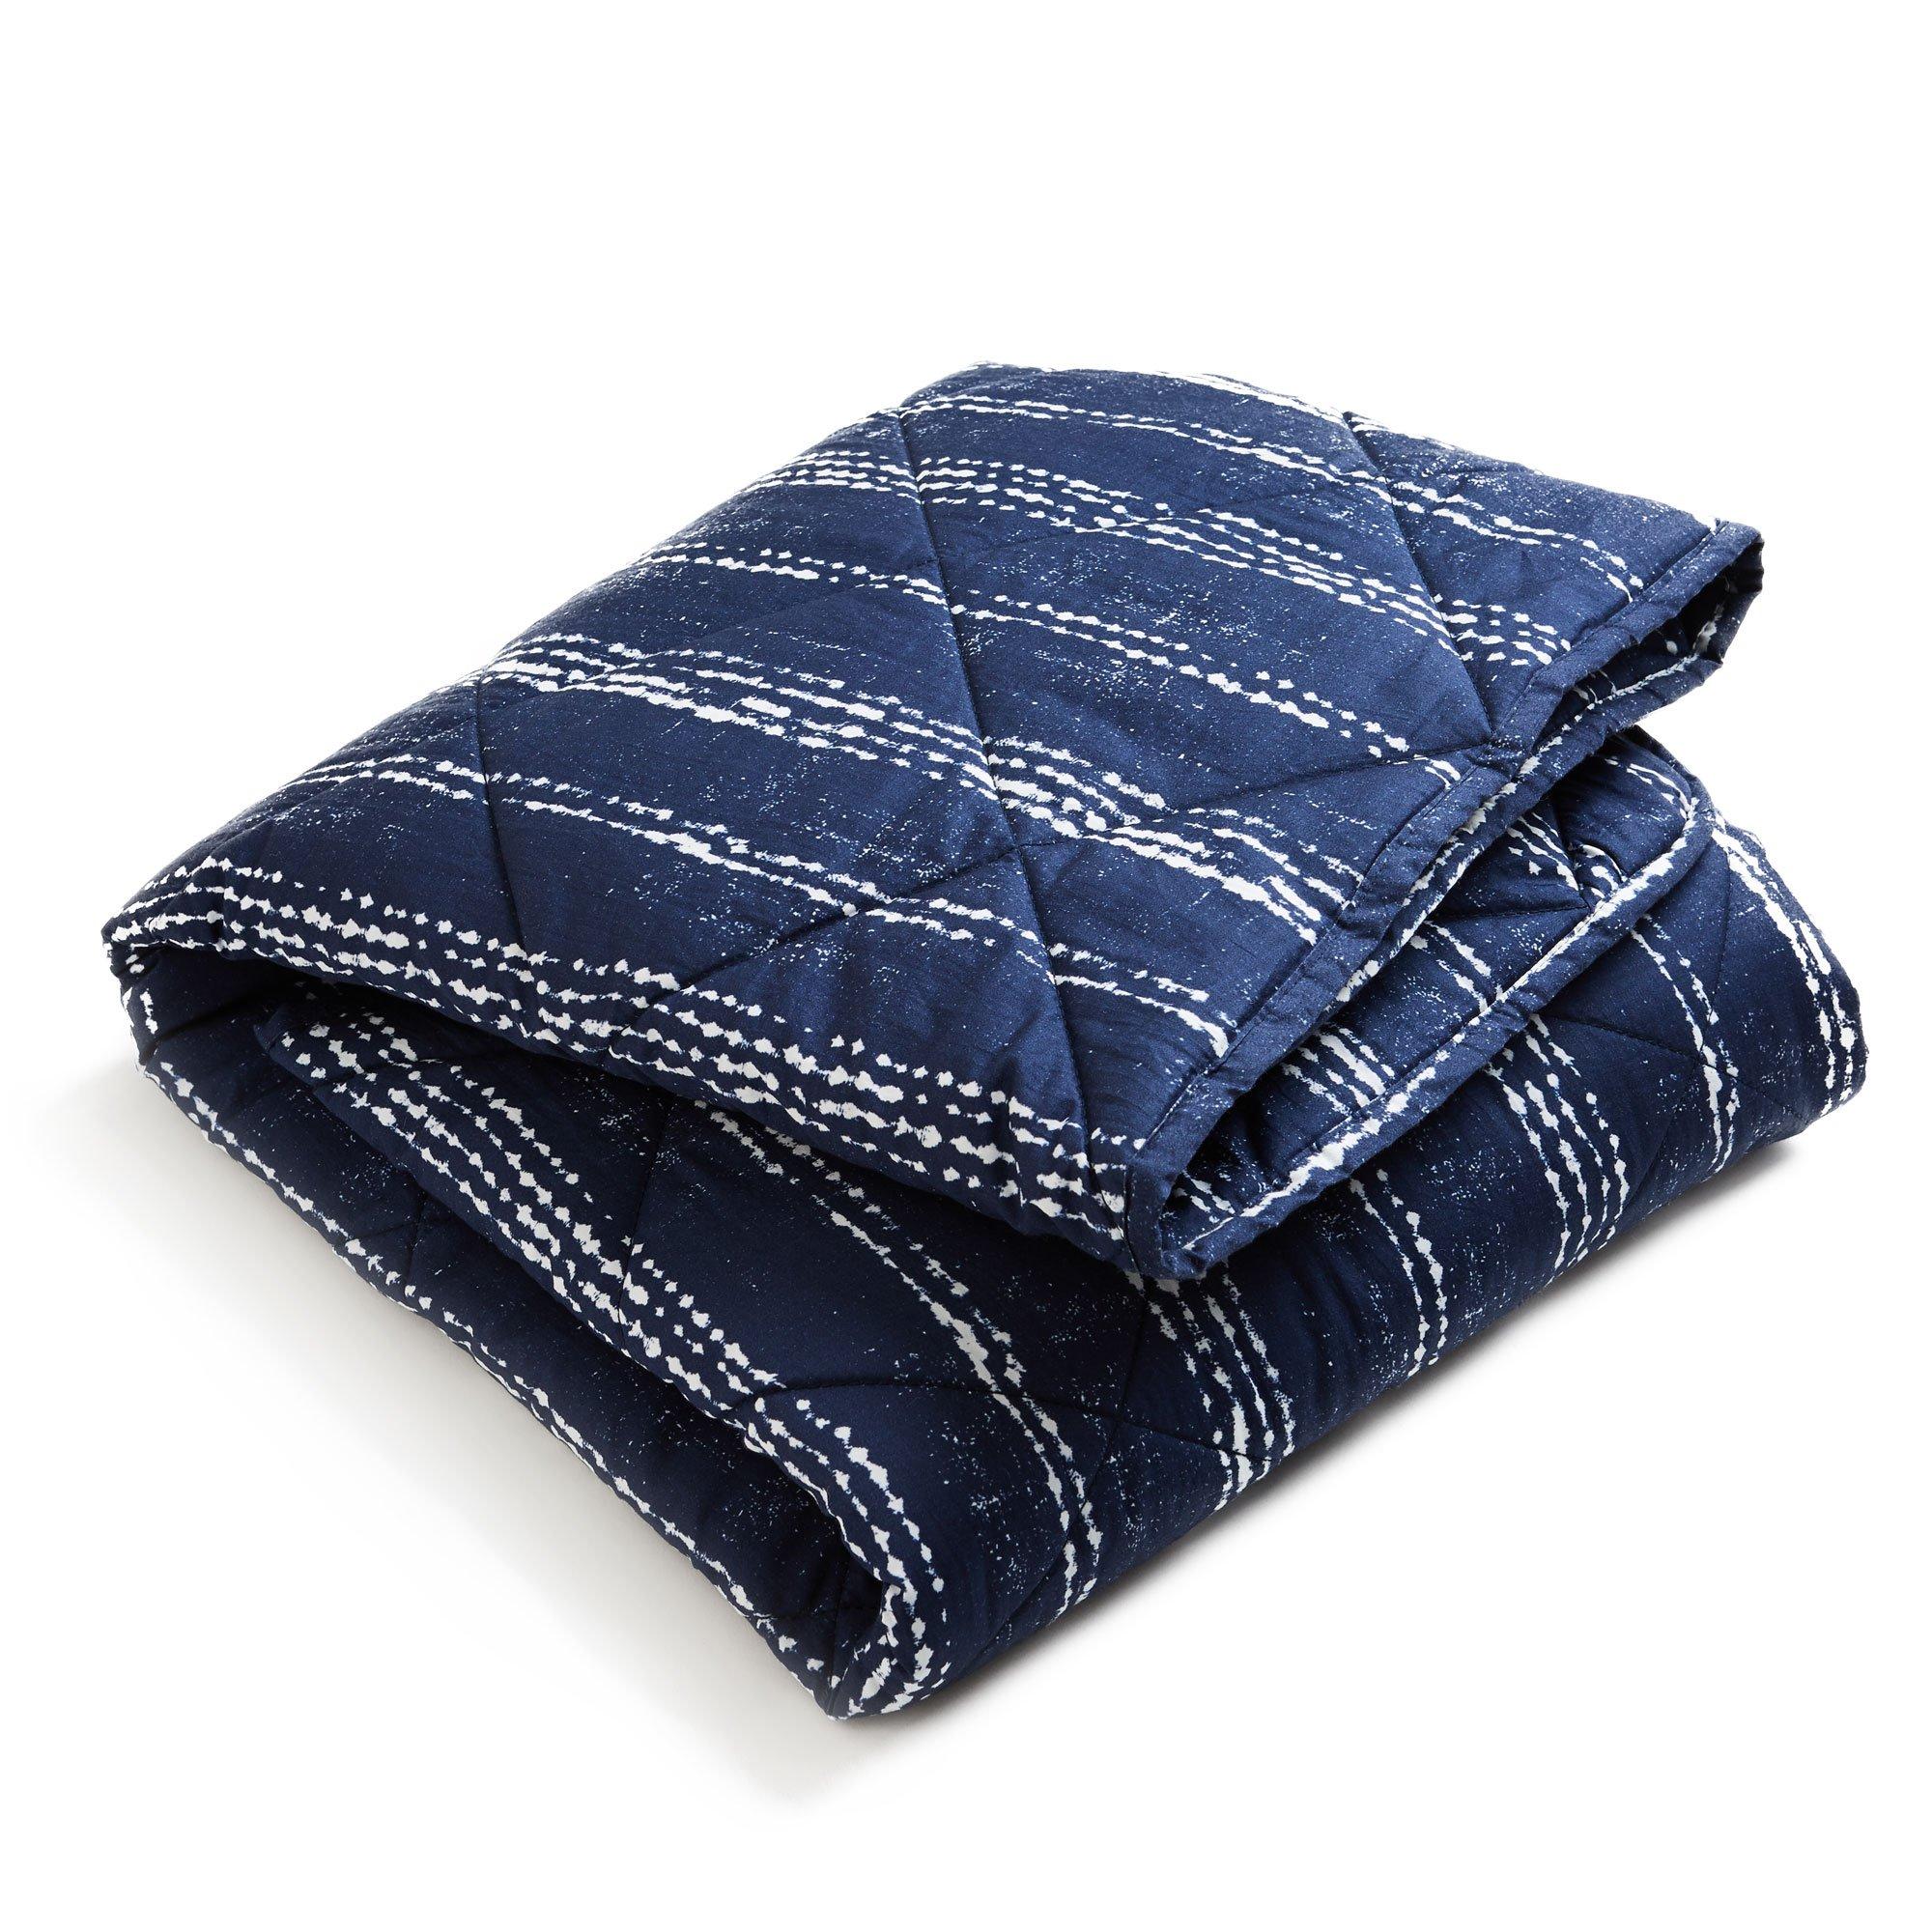 Brooklyn Born Organic Quilt - Shibori, Navy/White, One Size